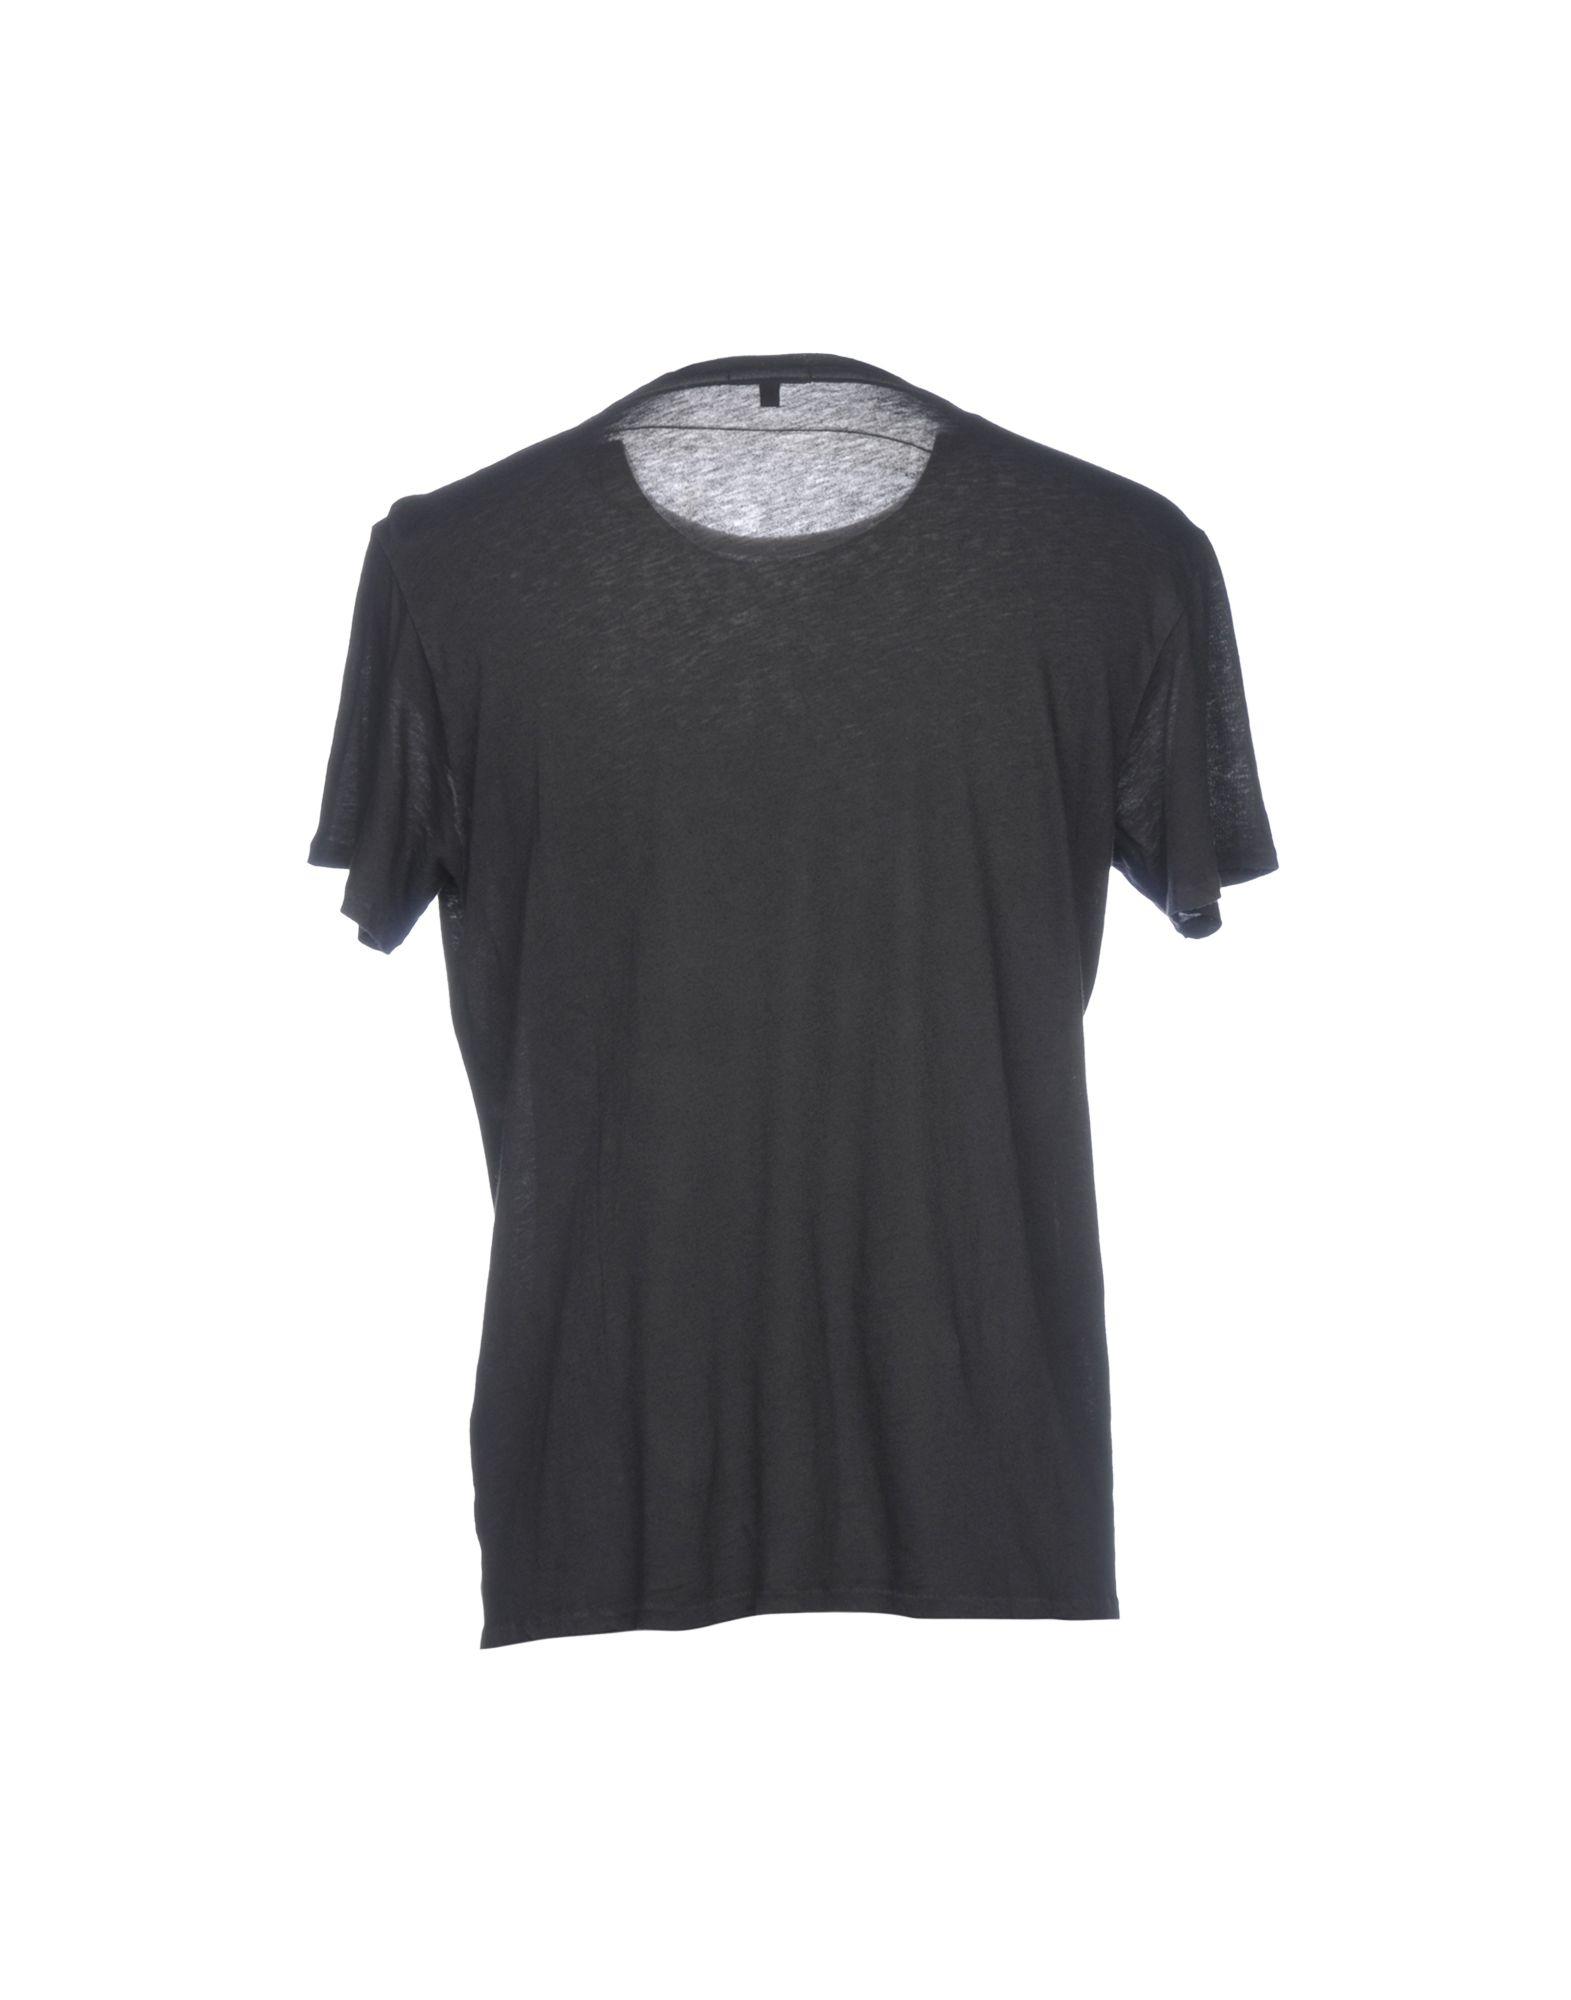 A buon mercato A buon mercato mercato buon T-Shirt R13 Uomo - 12200757PD 442628